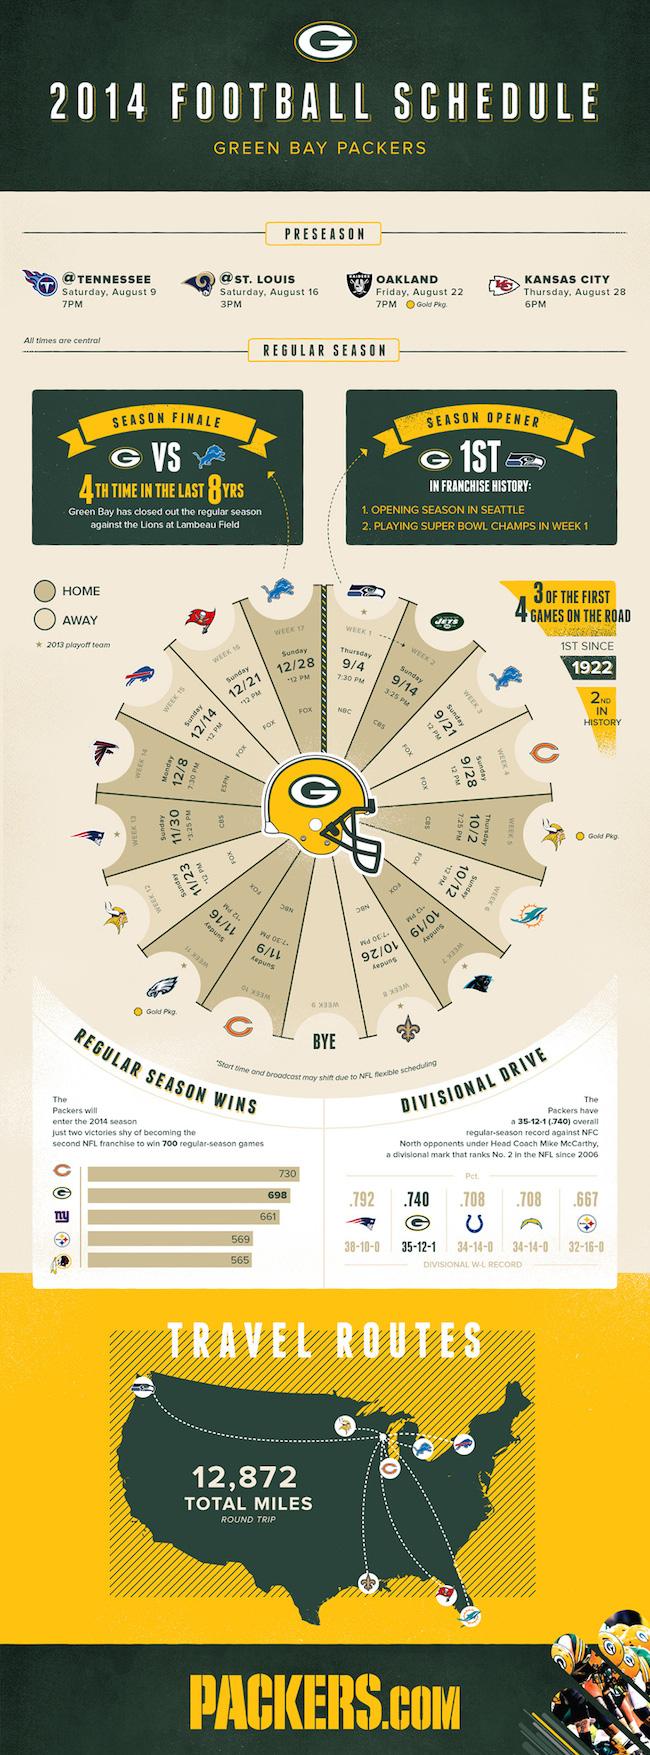 140425-schedule-infographic-920